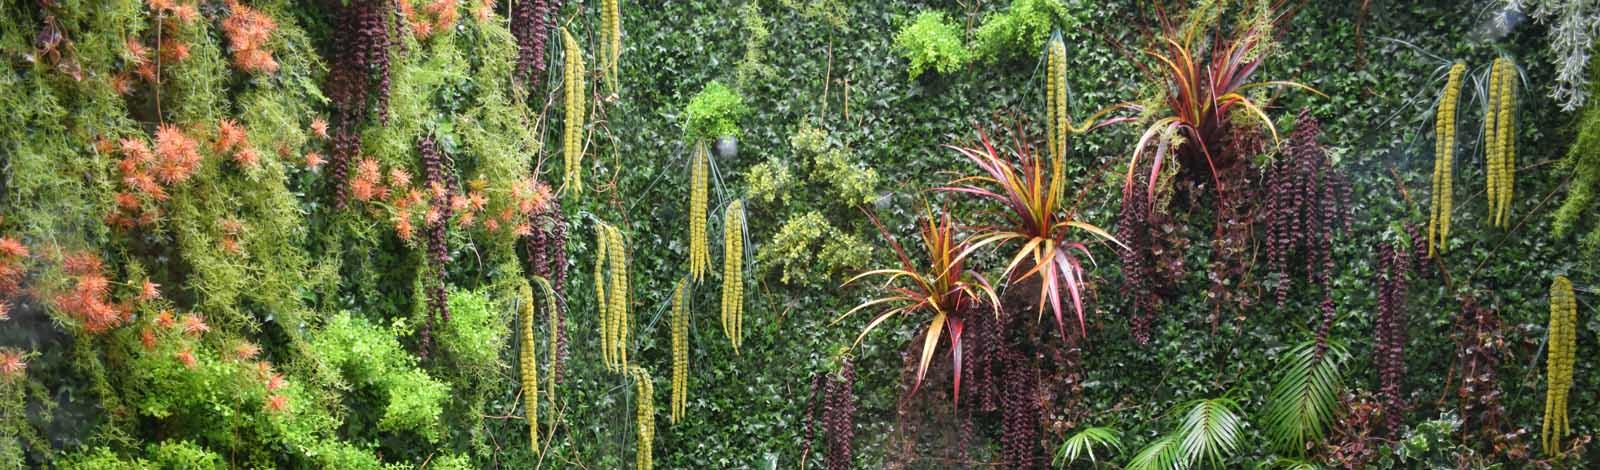 zelena stena zeleni zid green wall